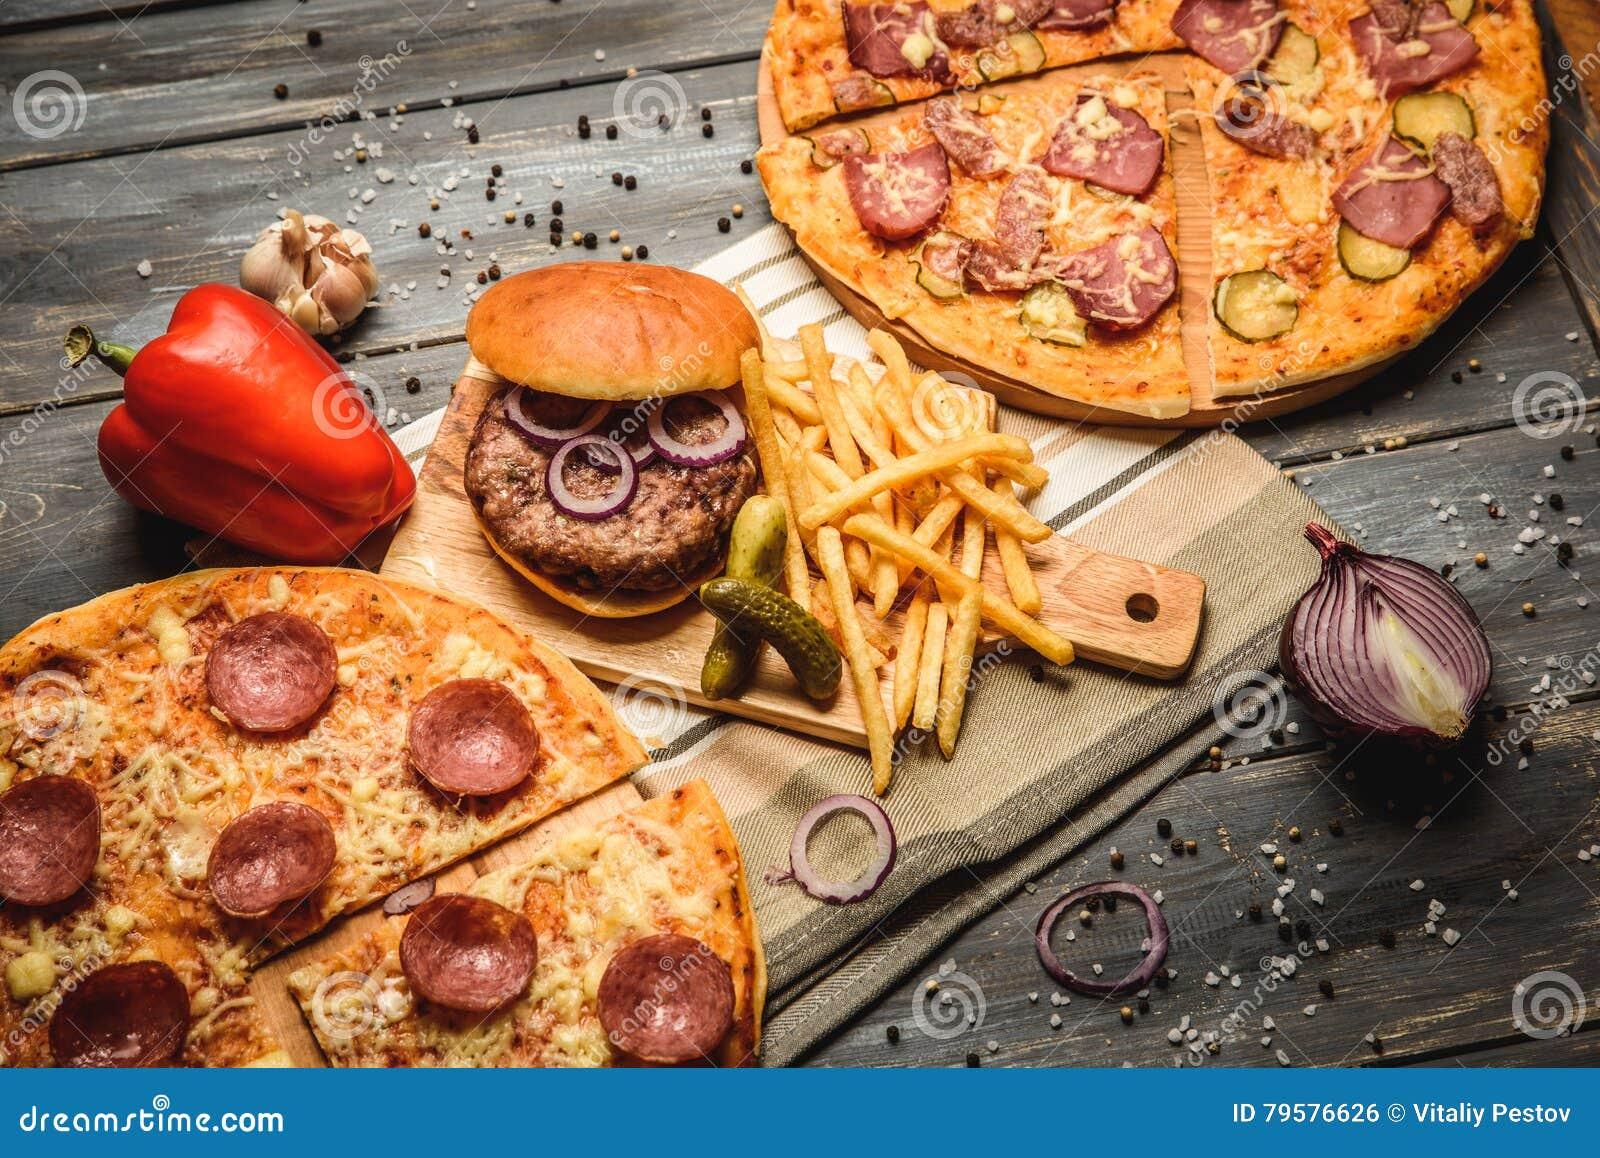 2 212 Pizza Hamburger Photos Free Royalty Free Stock Photos From Dreamstime